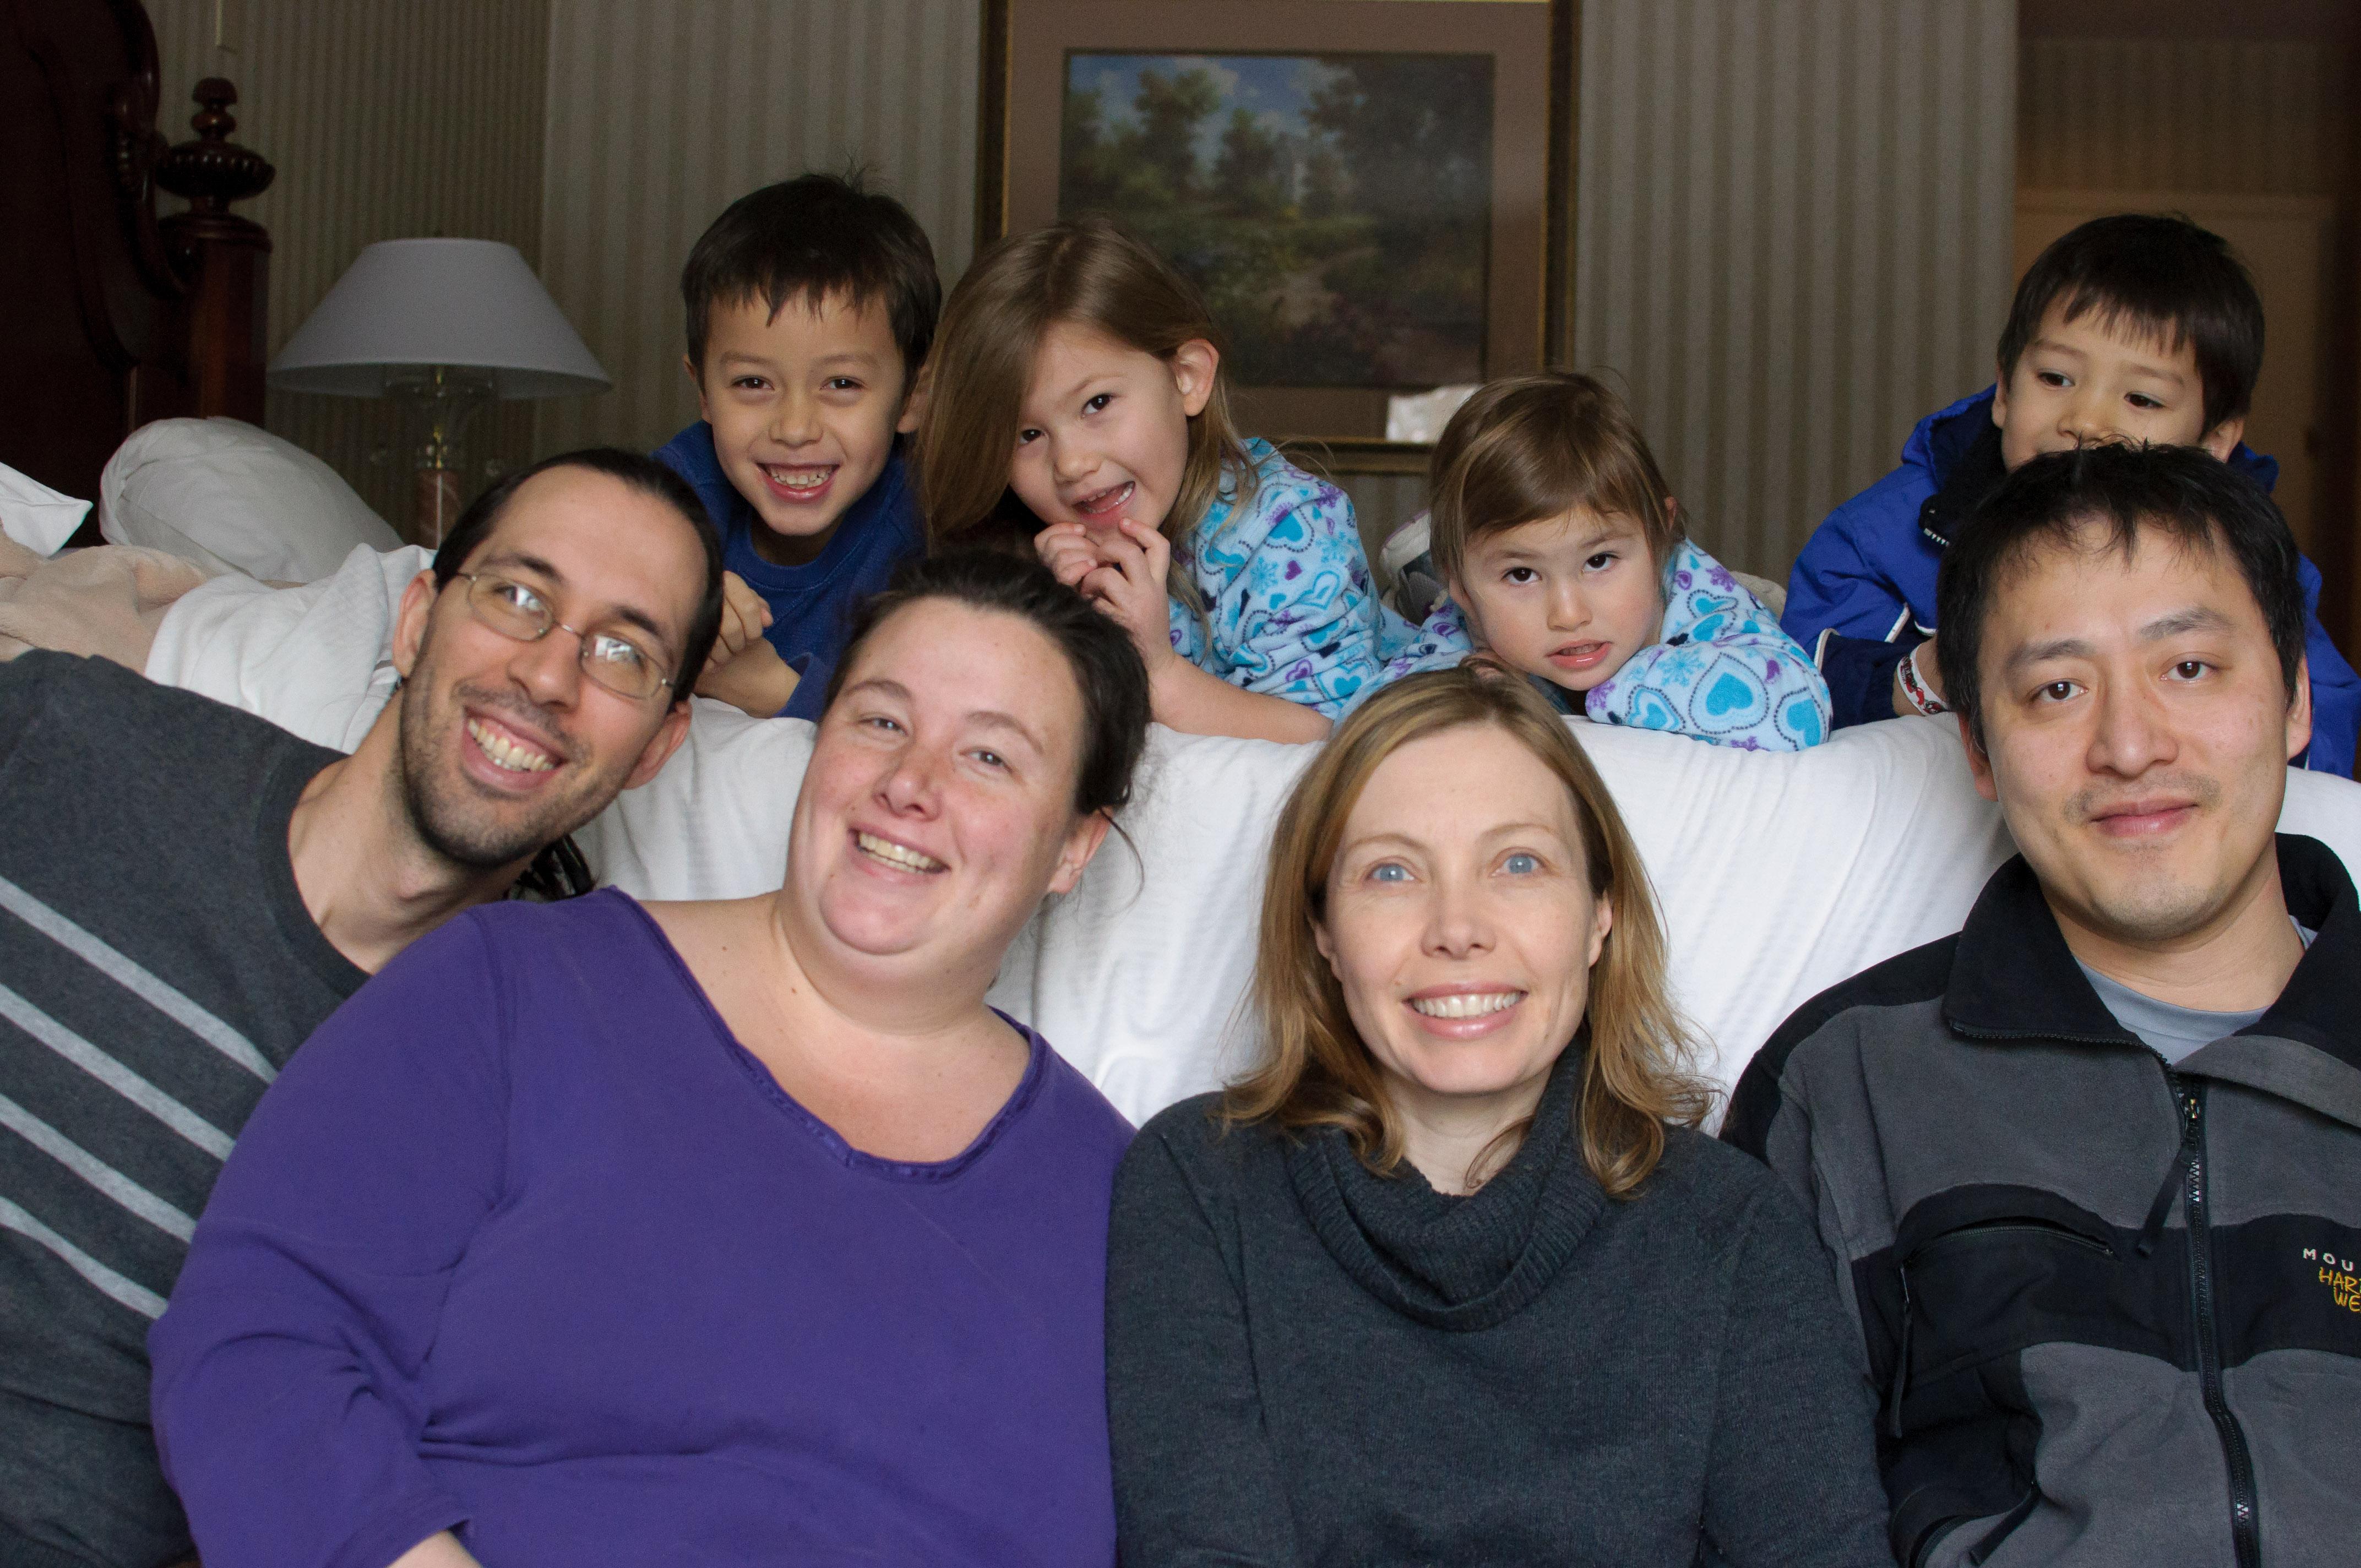 Jordi, Jen, Christina, Chanh (front), E, Josie, Celia, Z (back)